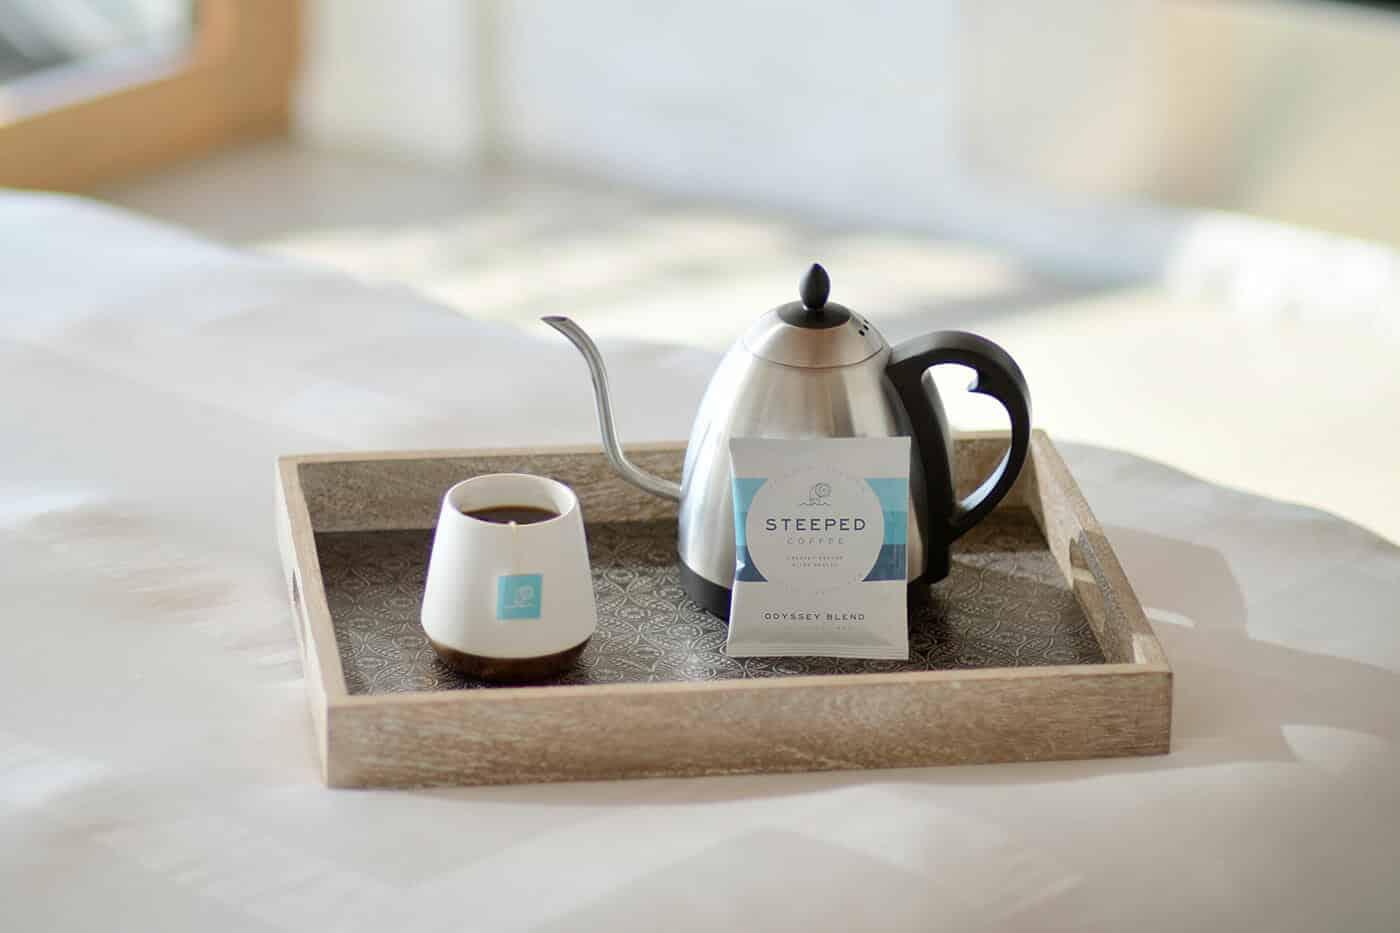 Bereidingsmethodes voor luie koffiedrinkers koffiezakjes